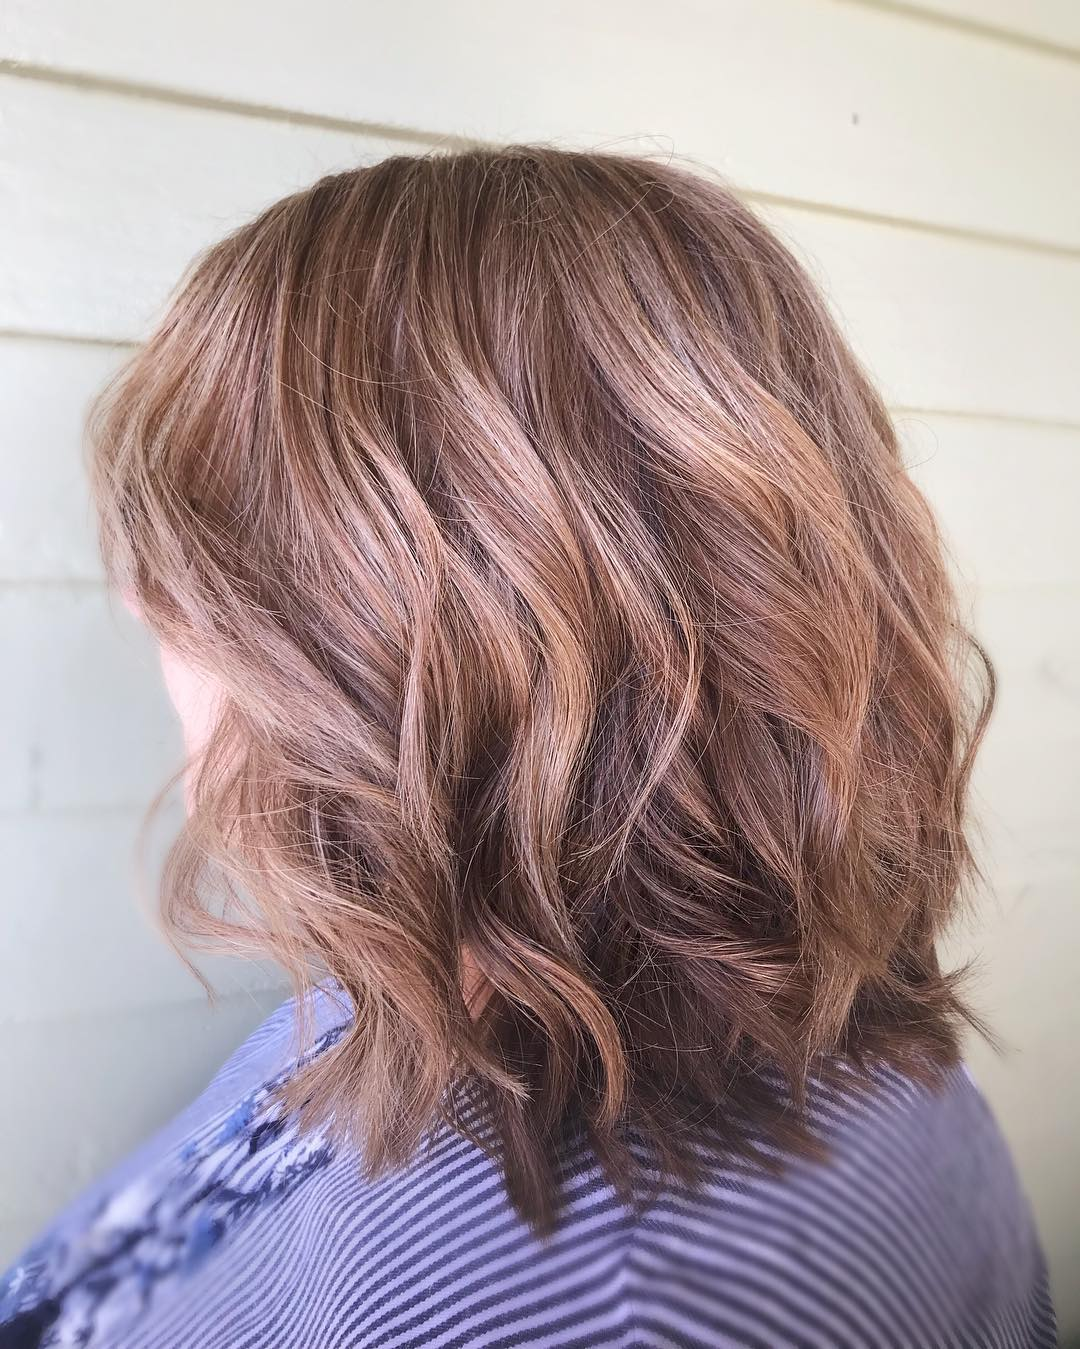 Стрижки после 60 лет на средние волосы 2020 фото 6